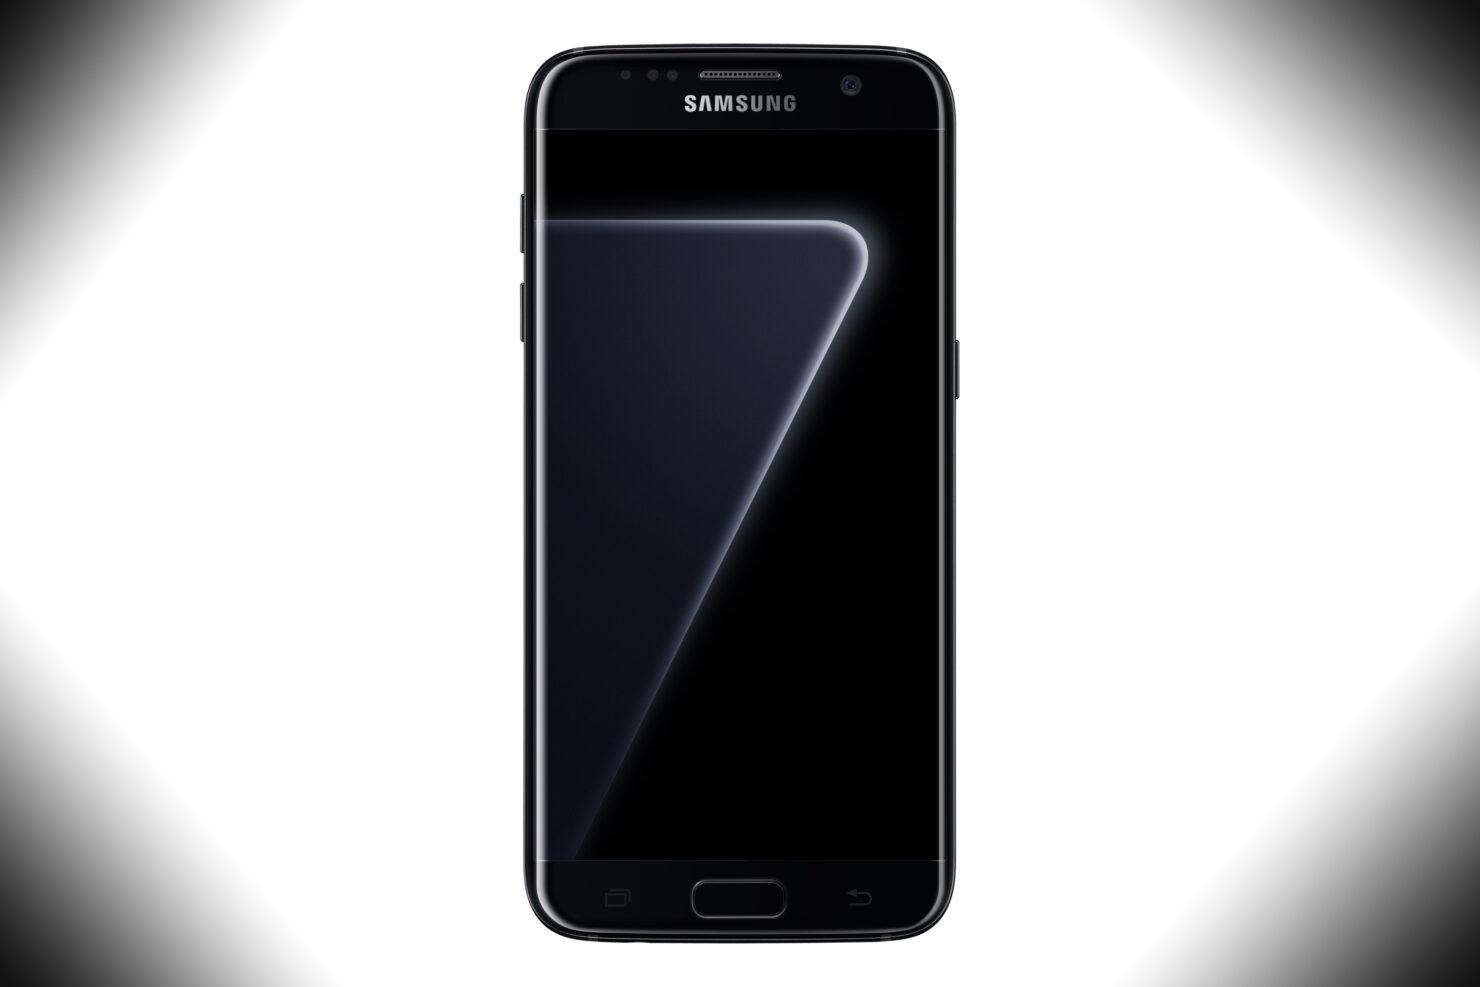 Galaxy S7 edge Black Pearl official